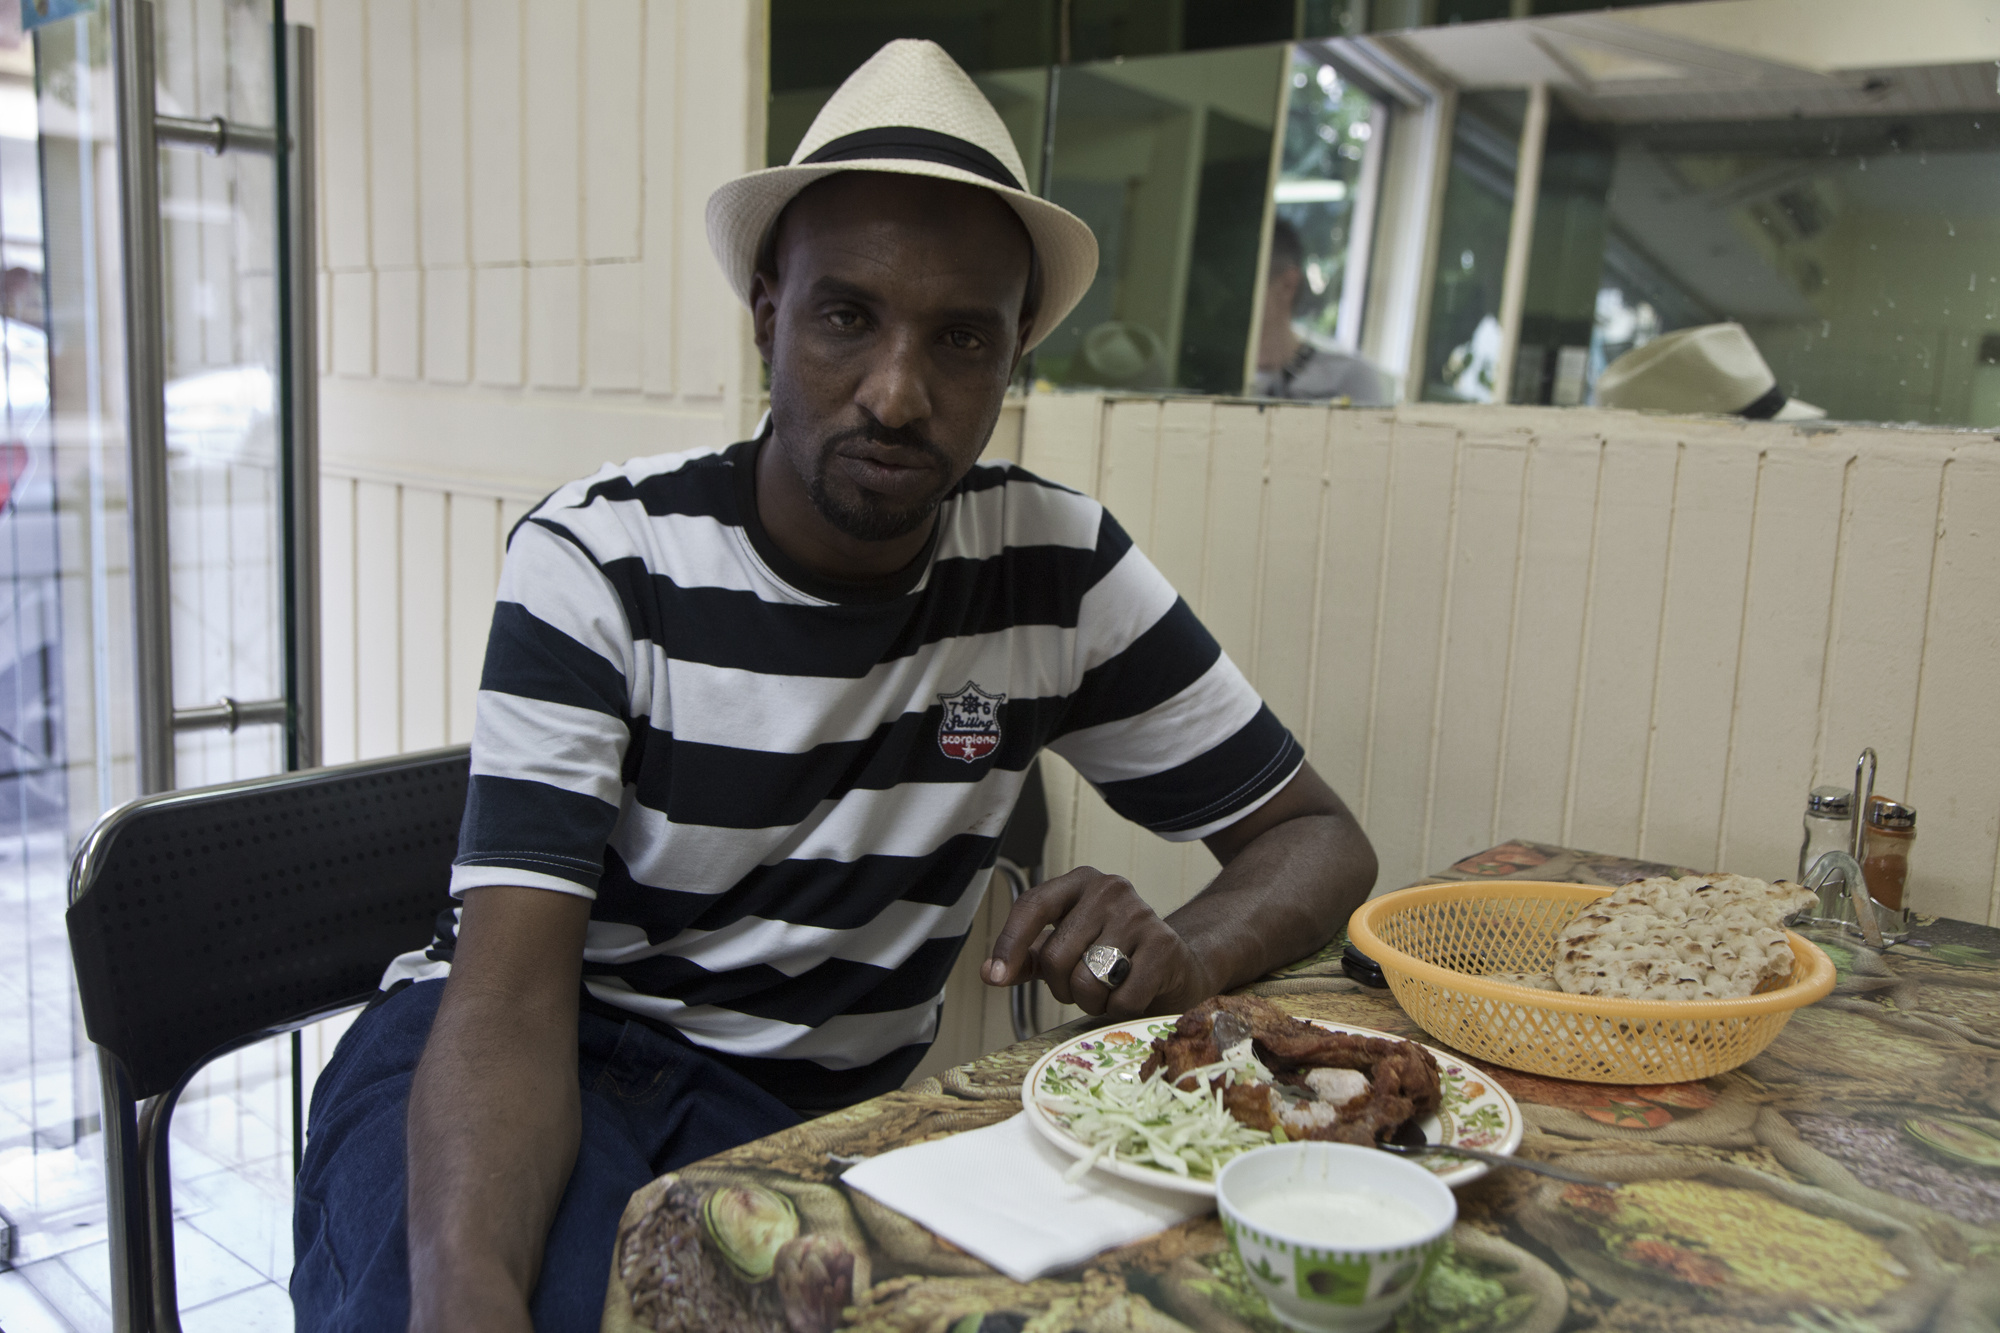 O Moυσταφά από τη Σομαλία είναι χρόνια πελάτης του Μπασάρ στην Αριστοτέλους.